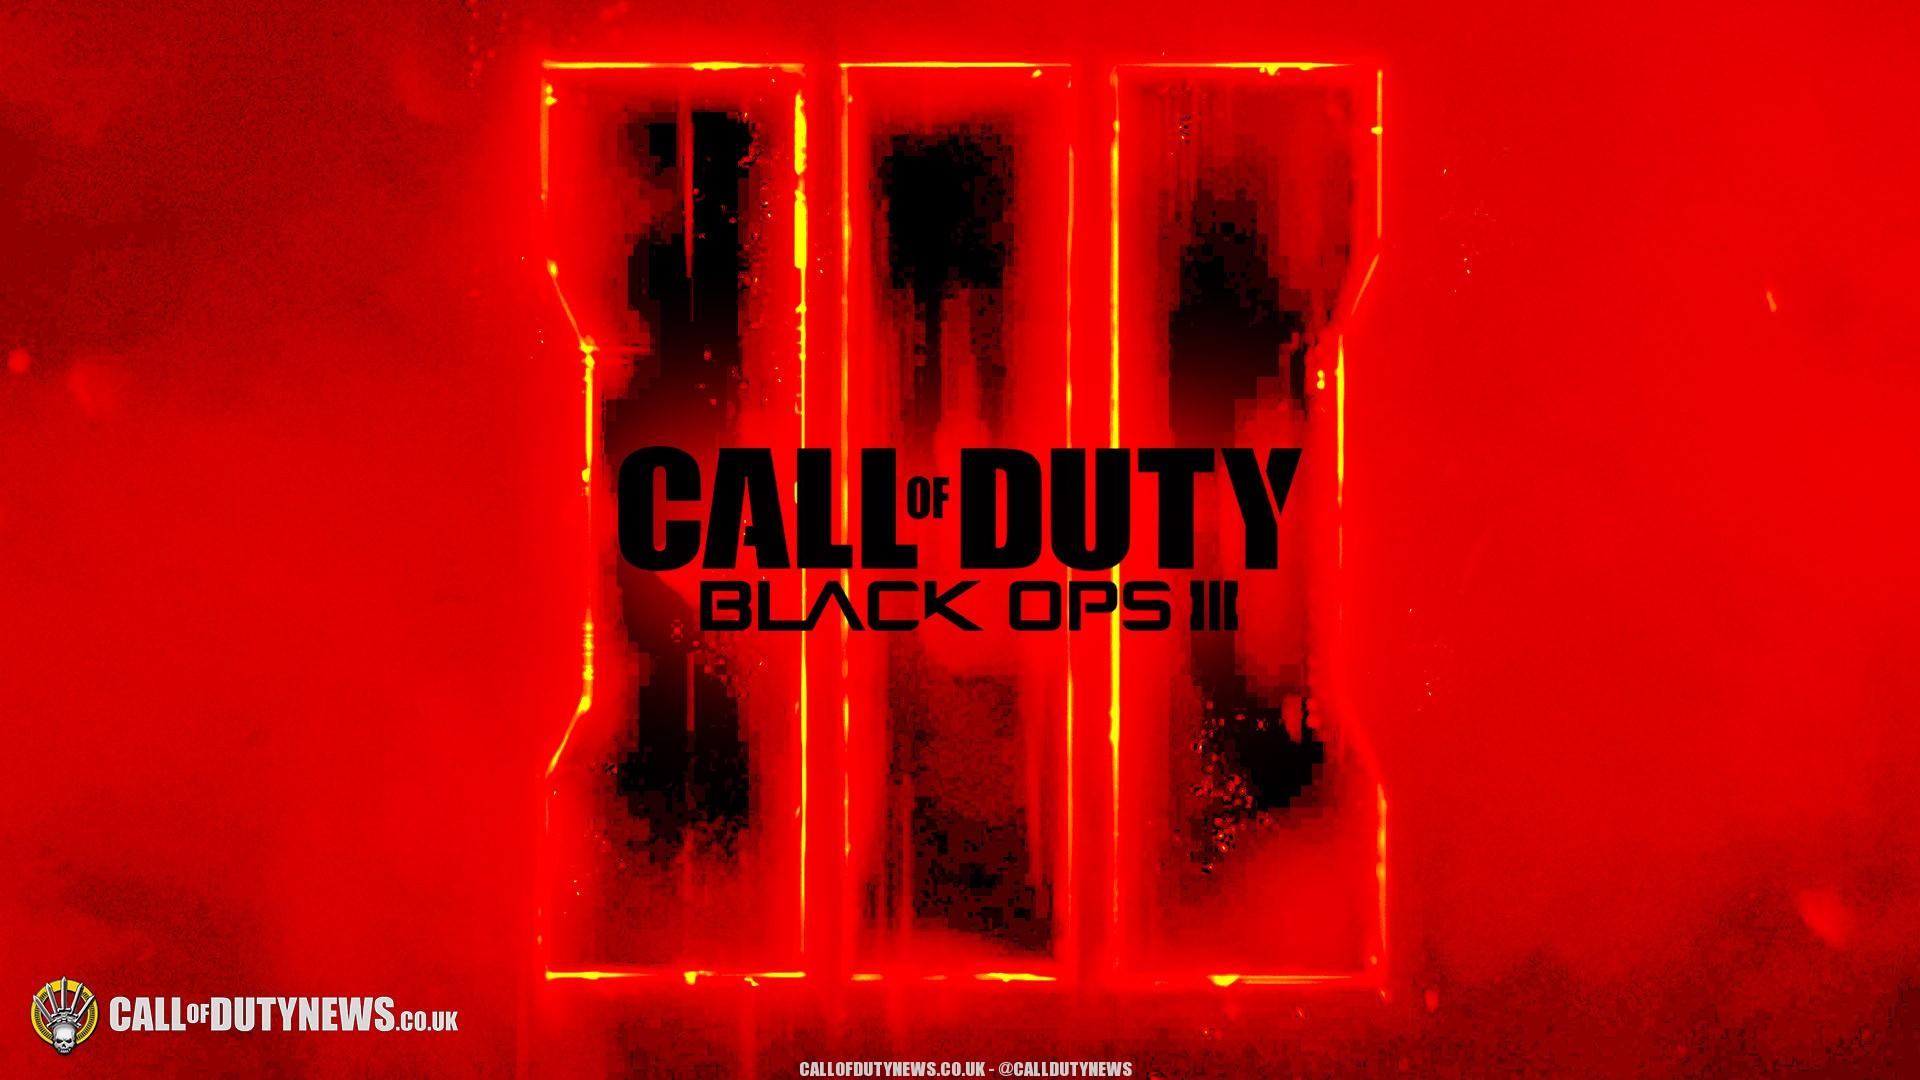 47 Call Of Duty Bo3 Wallpapers On Wallpapersafari